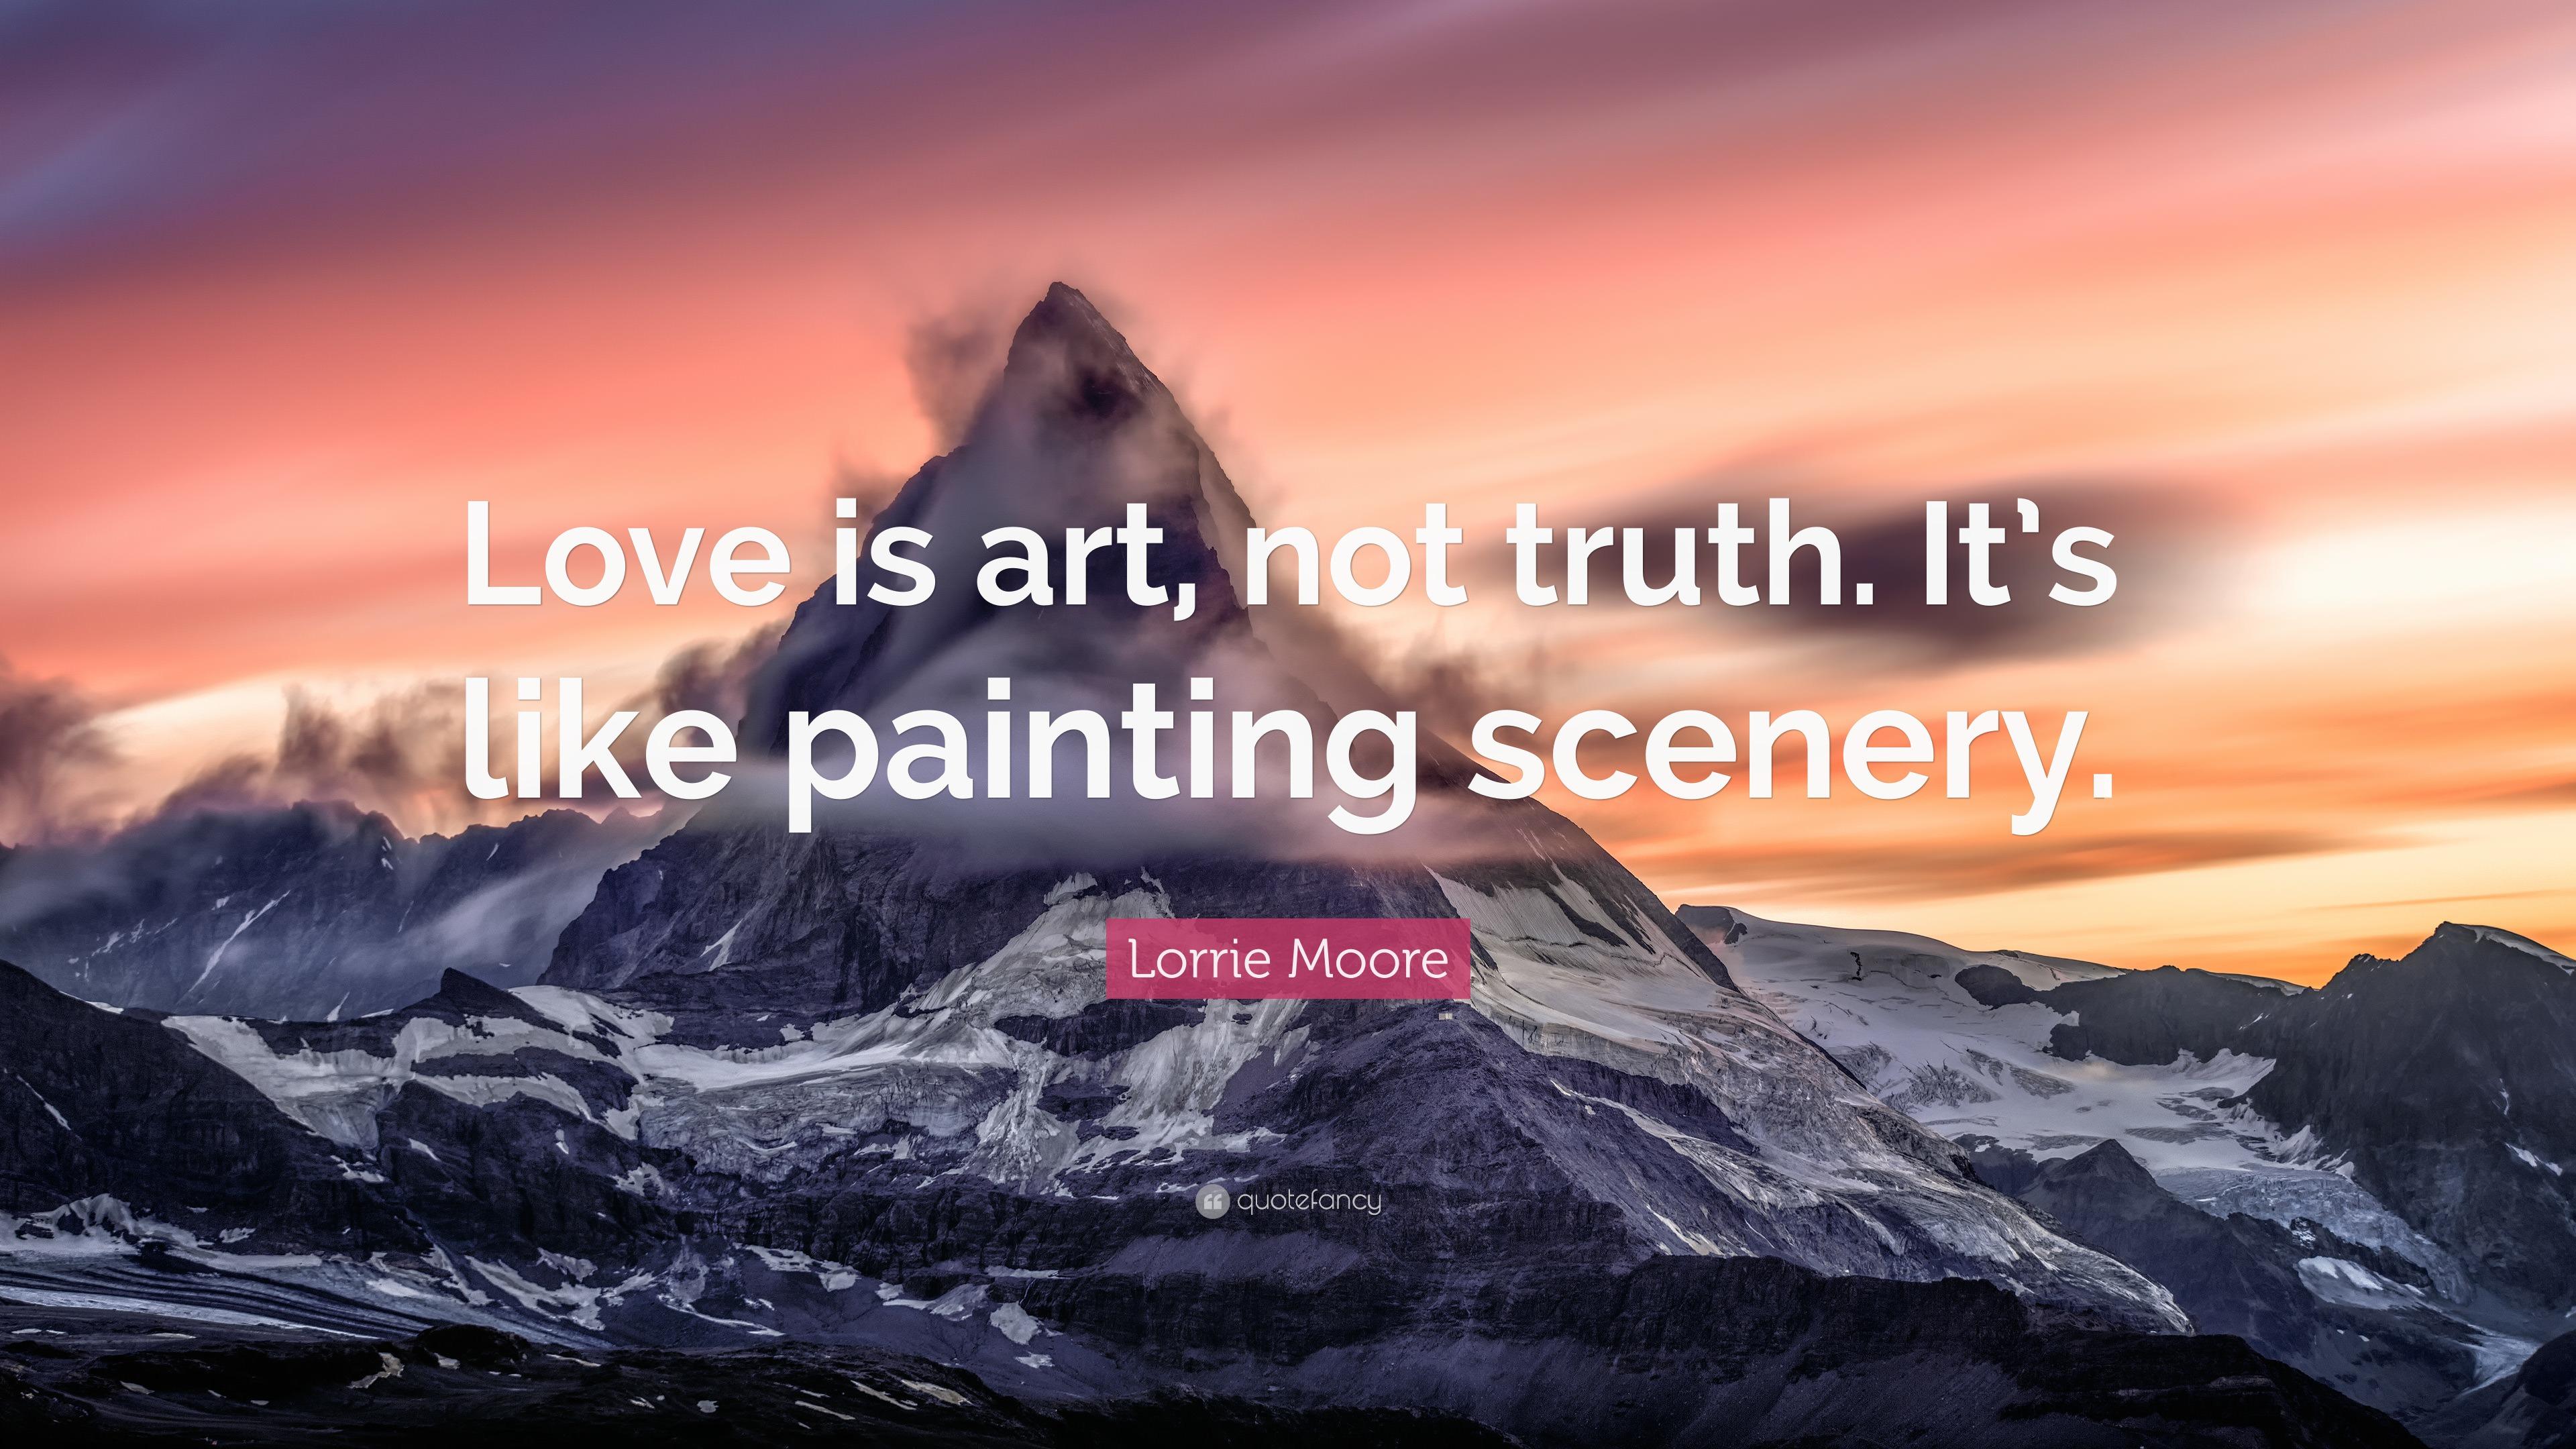 Popular Wallpaper Love Scenery - 2916986-Lorrie-Moore-Quote-Love-is-art-not-truth-It-s-like-painting  Snapshot_446796.jpg